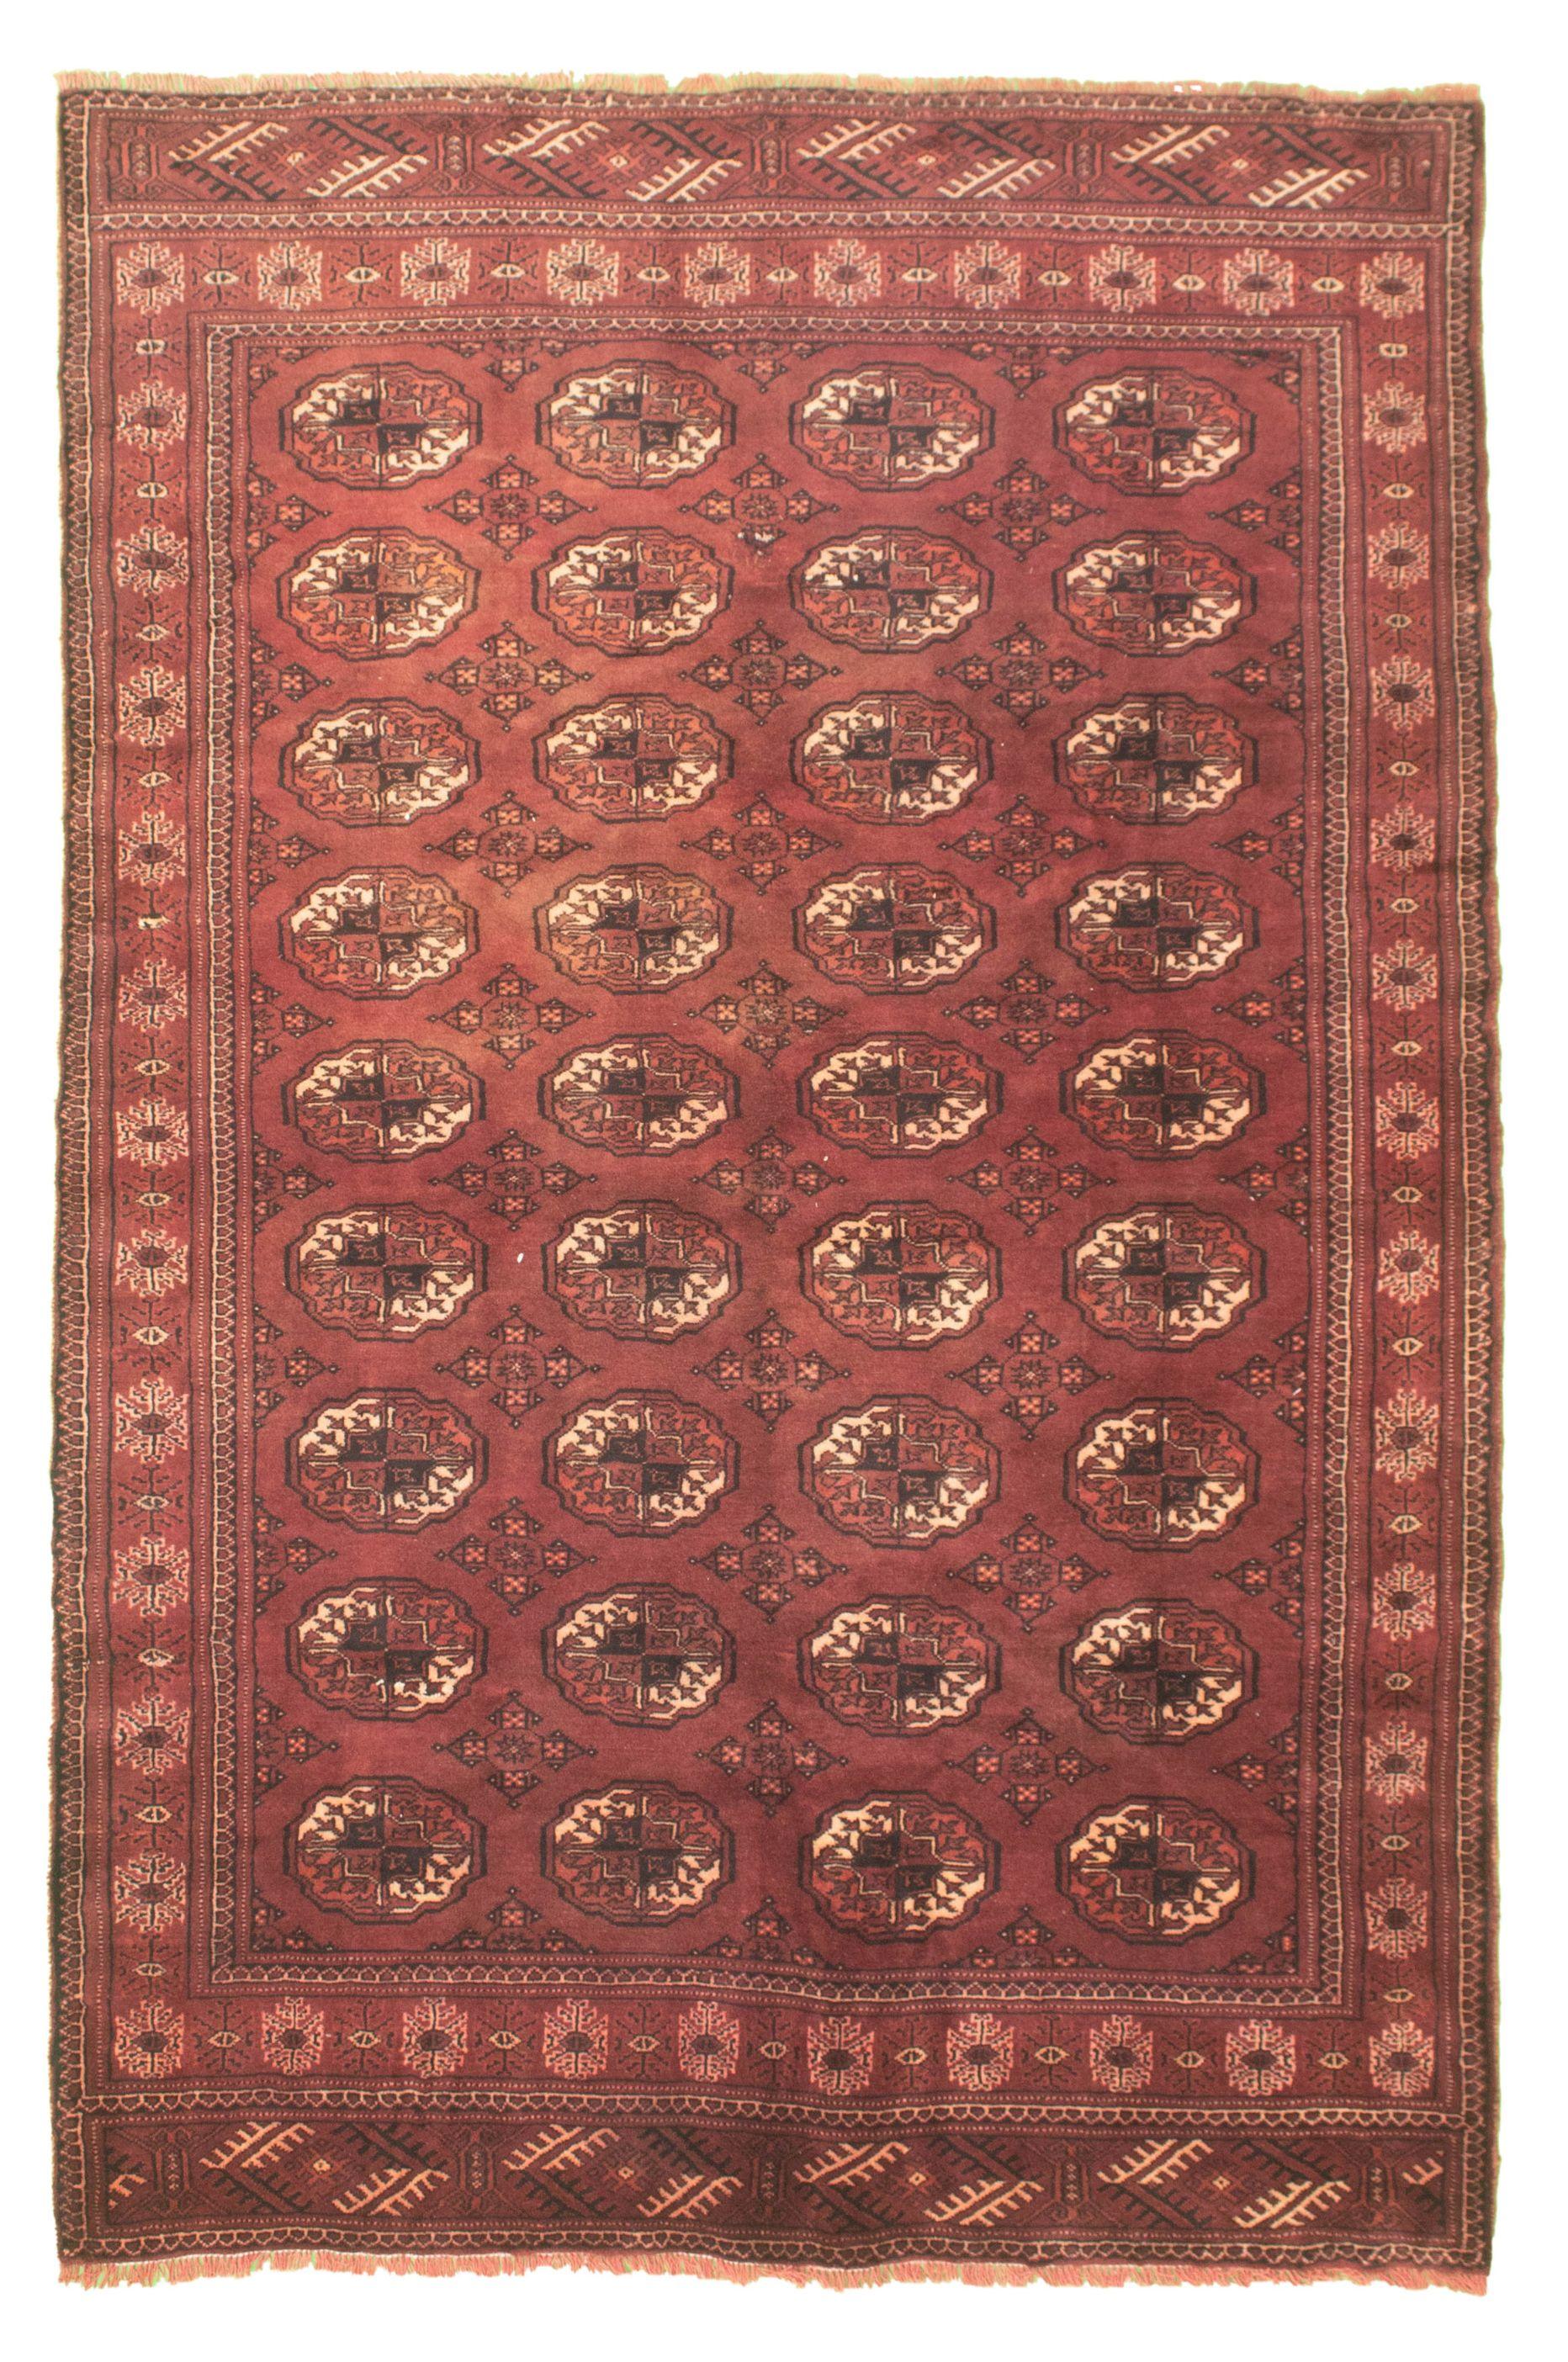 "Hand-knotted Shiravan Bokhara Burgundy Wool Rug 5'5"" x 8'6"" Size: 5'5"" x 8'6"""